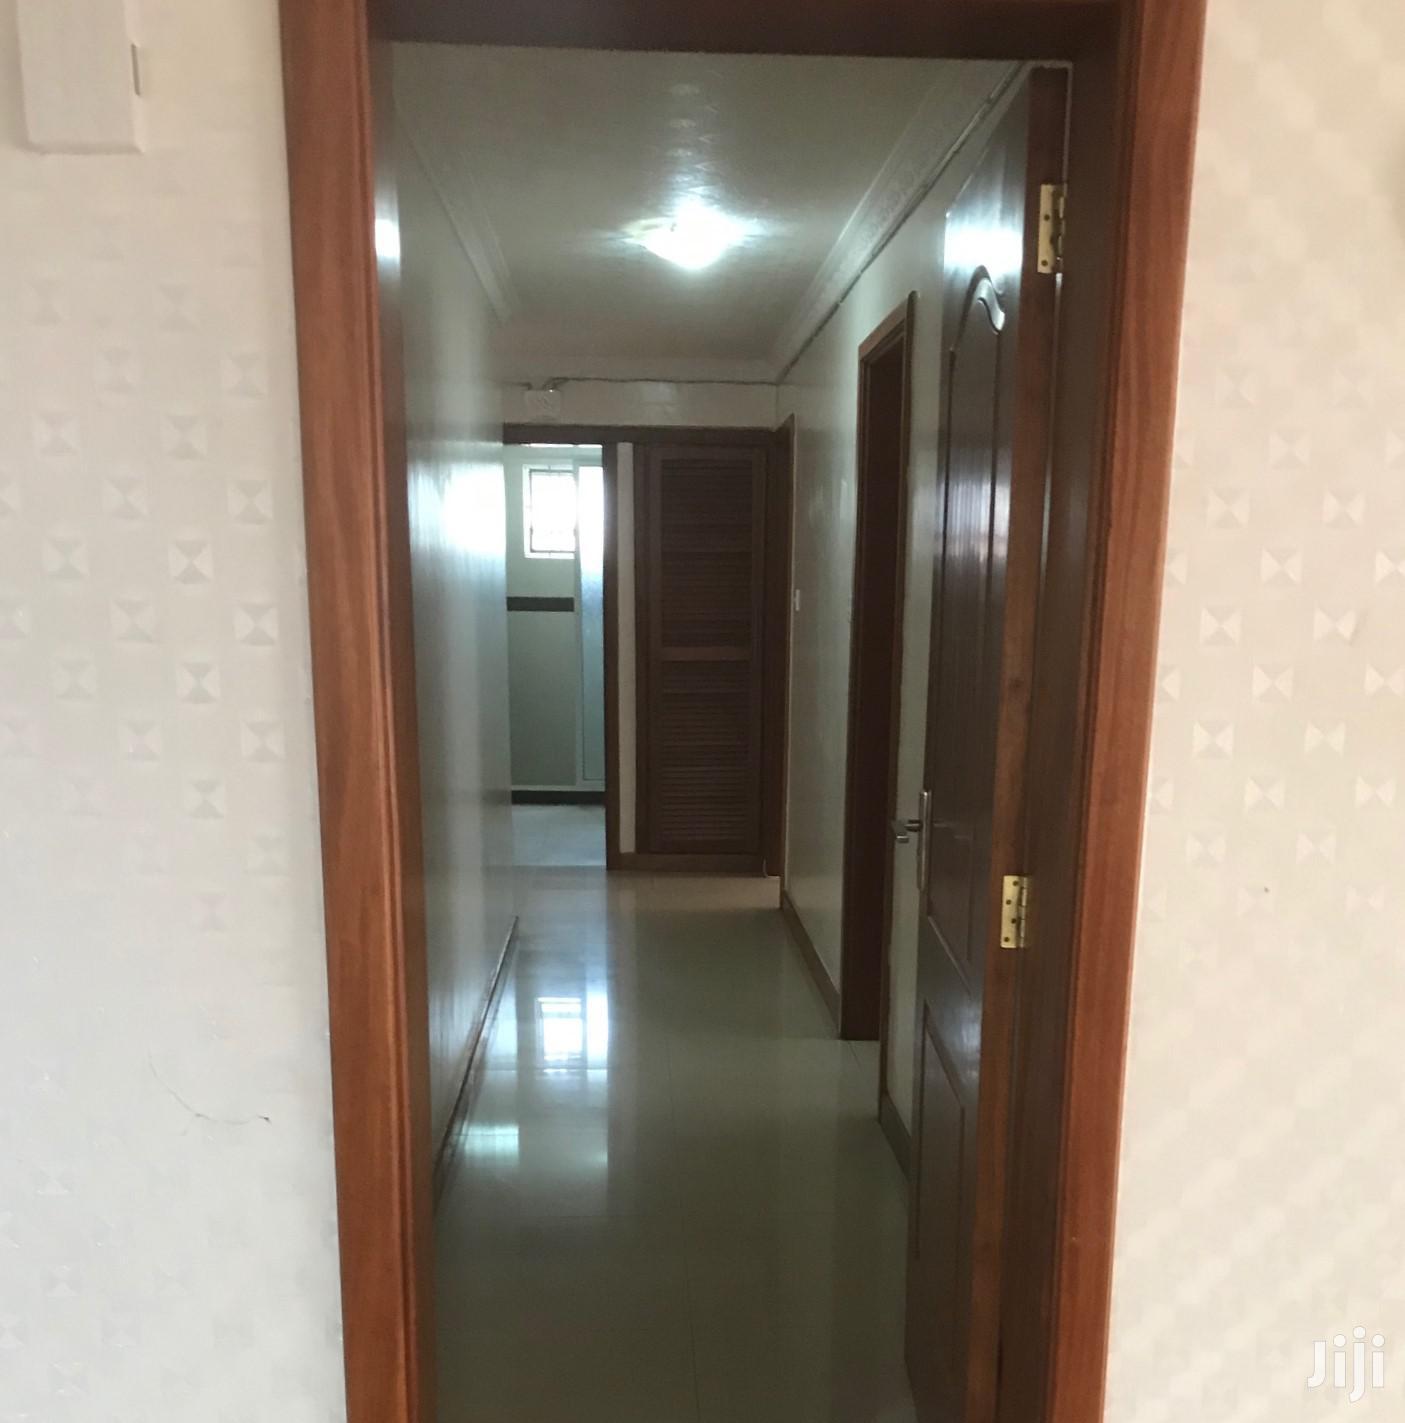 3 Bedroom Flat Apartment Next to Kasuku Center | Houses & Apartments For Rent for sale in Kileleshwa, Nairobi, Kenya